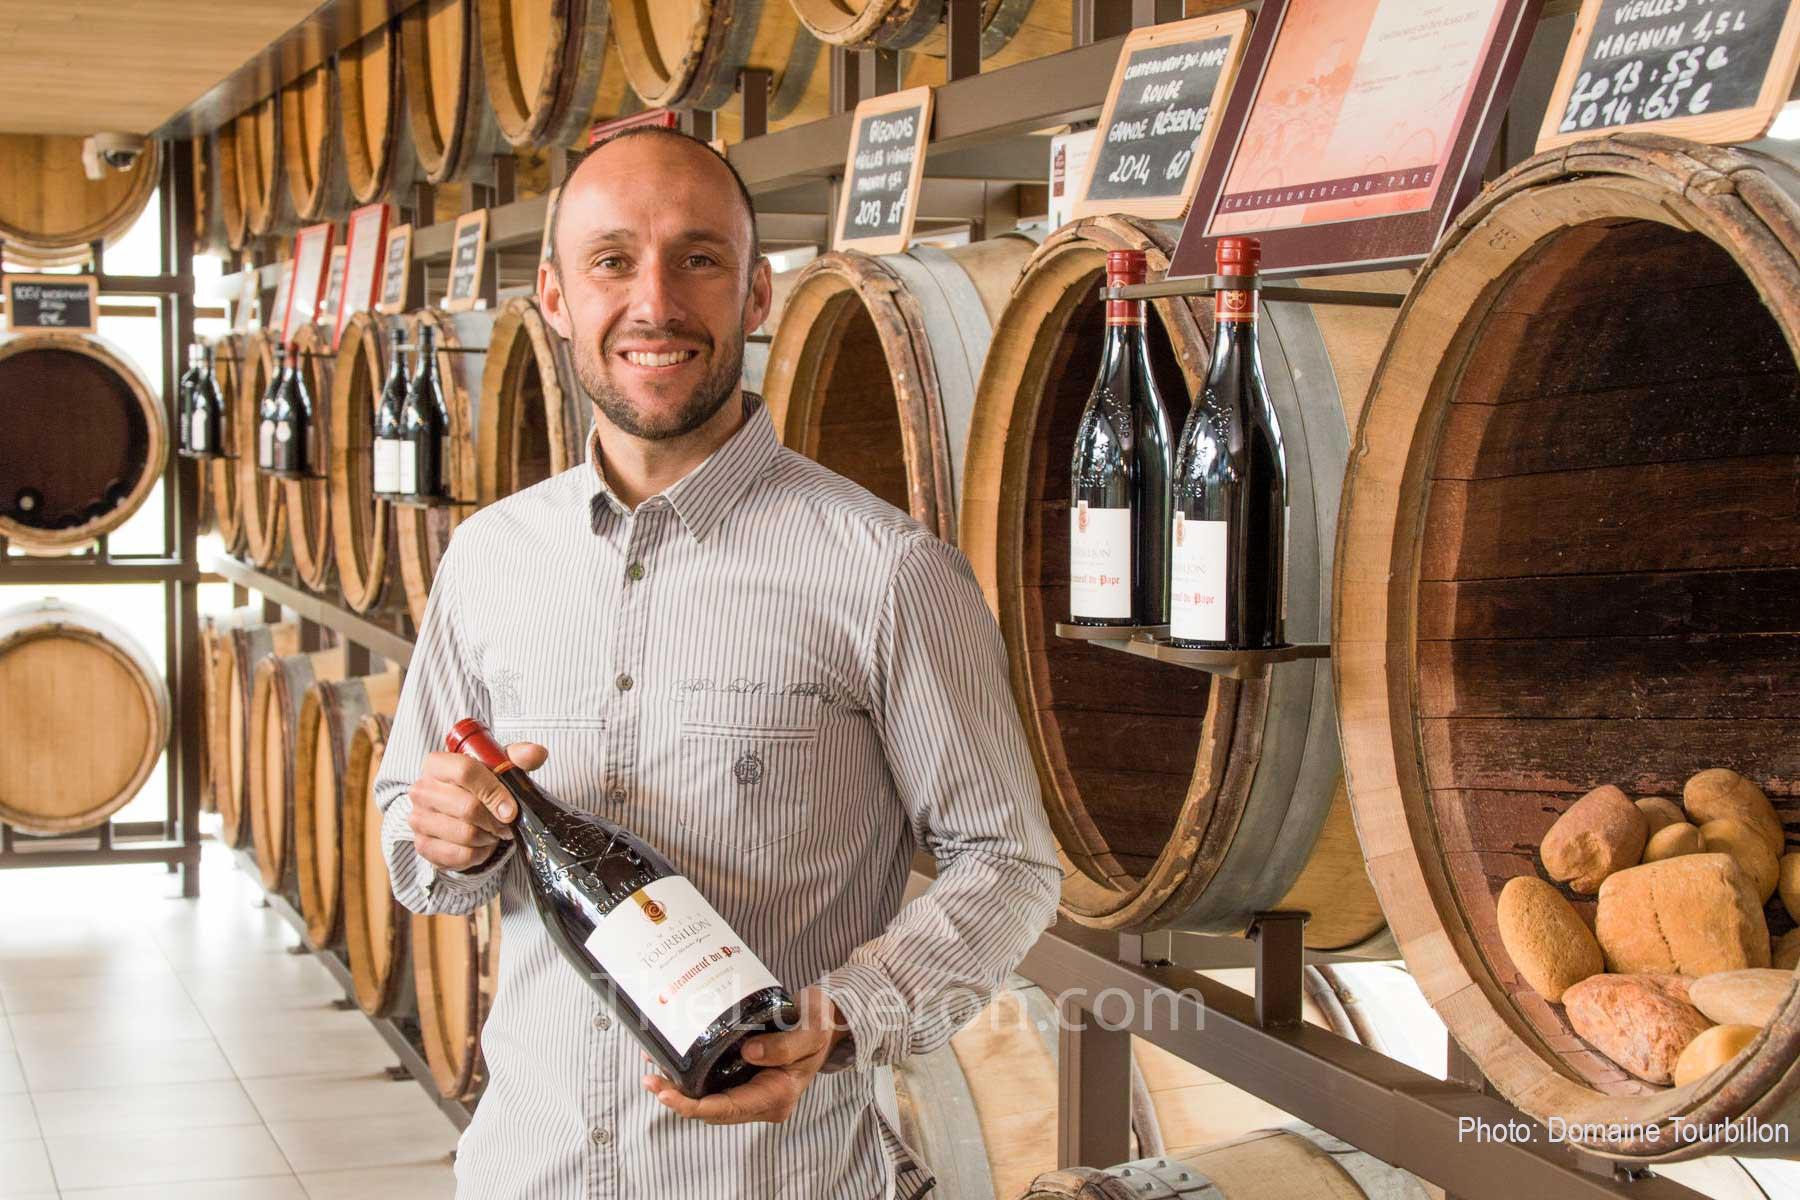 presenting wine